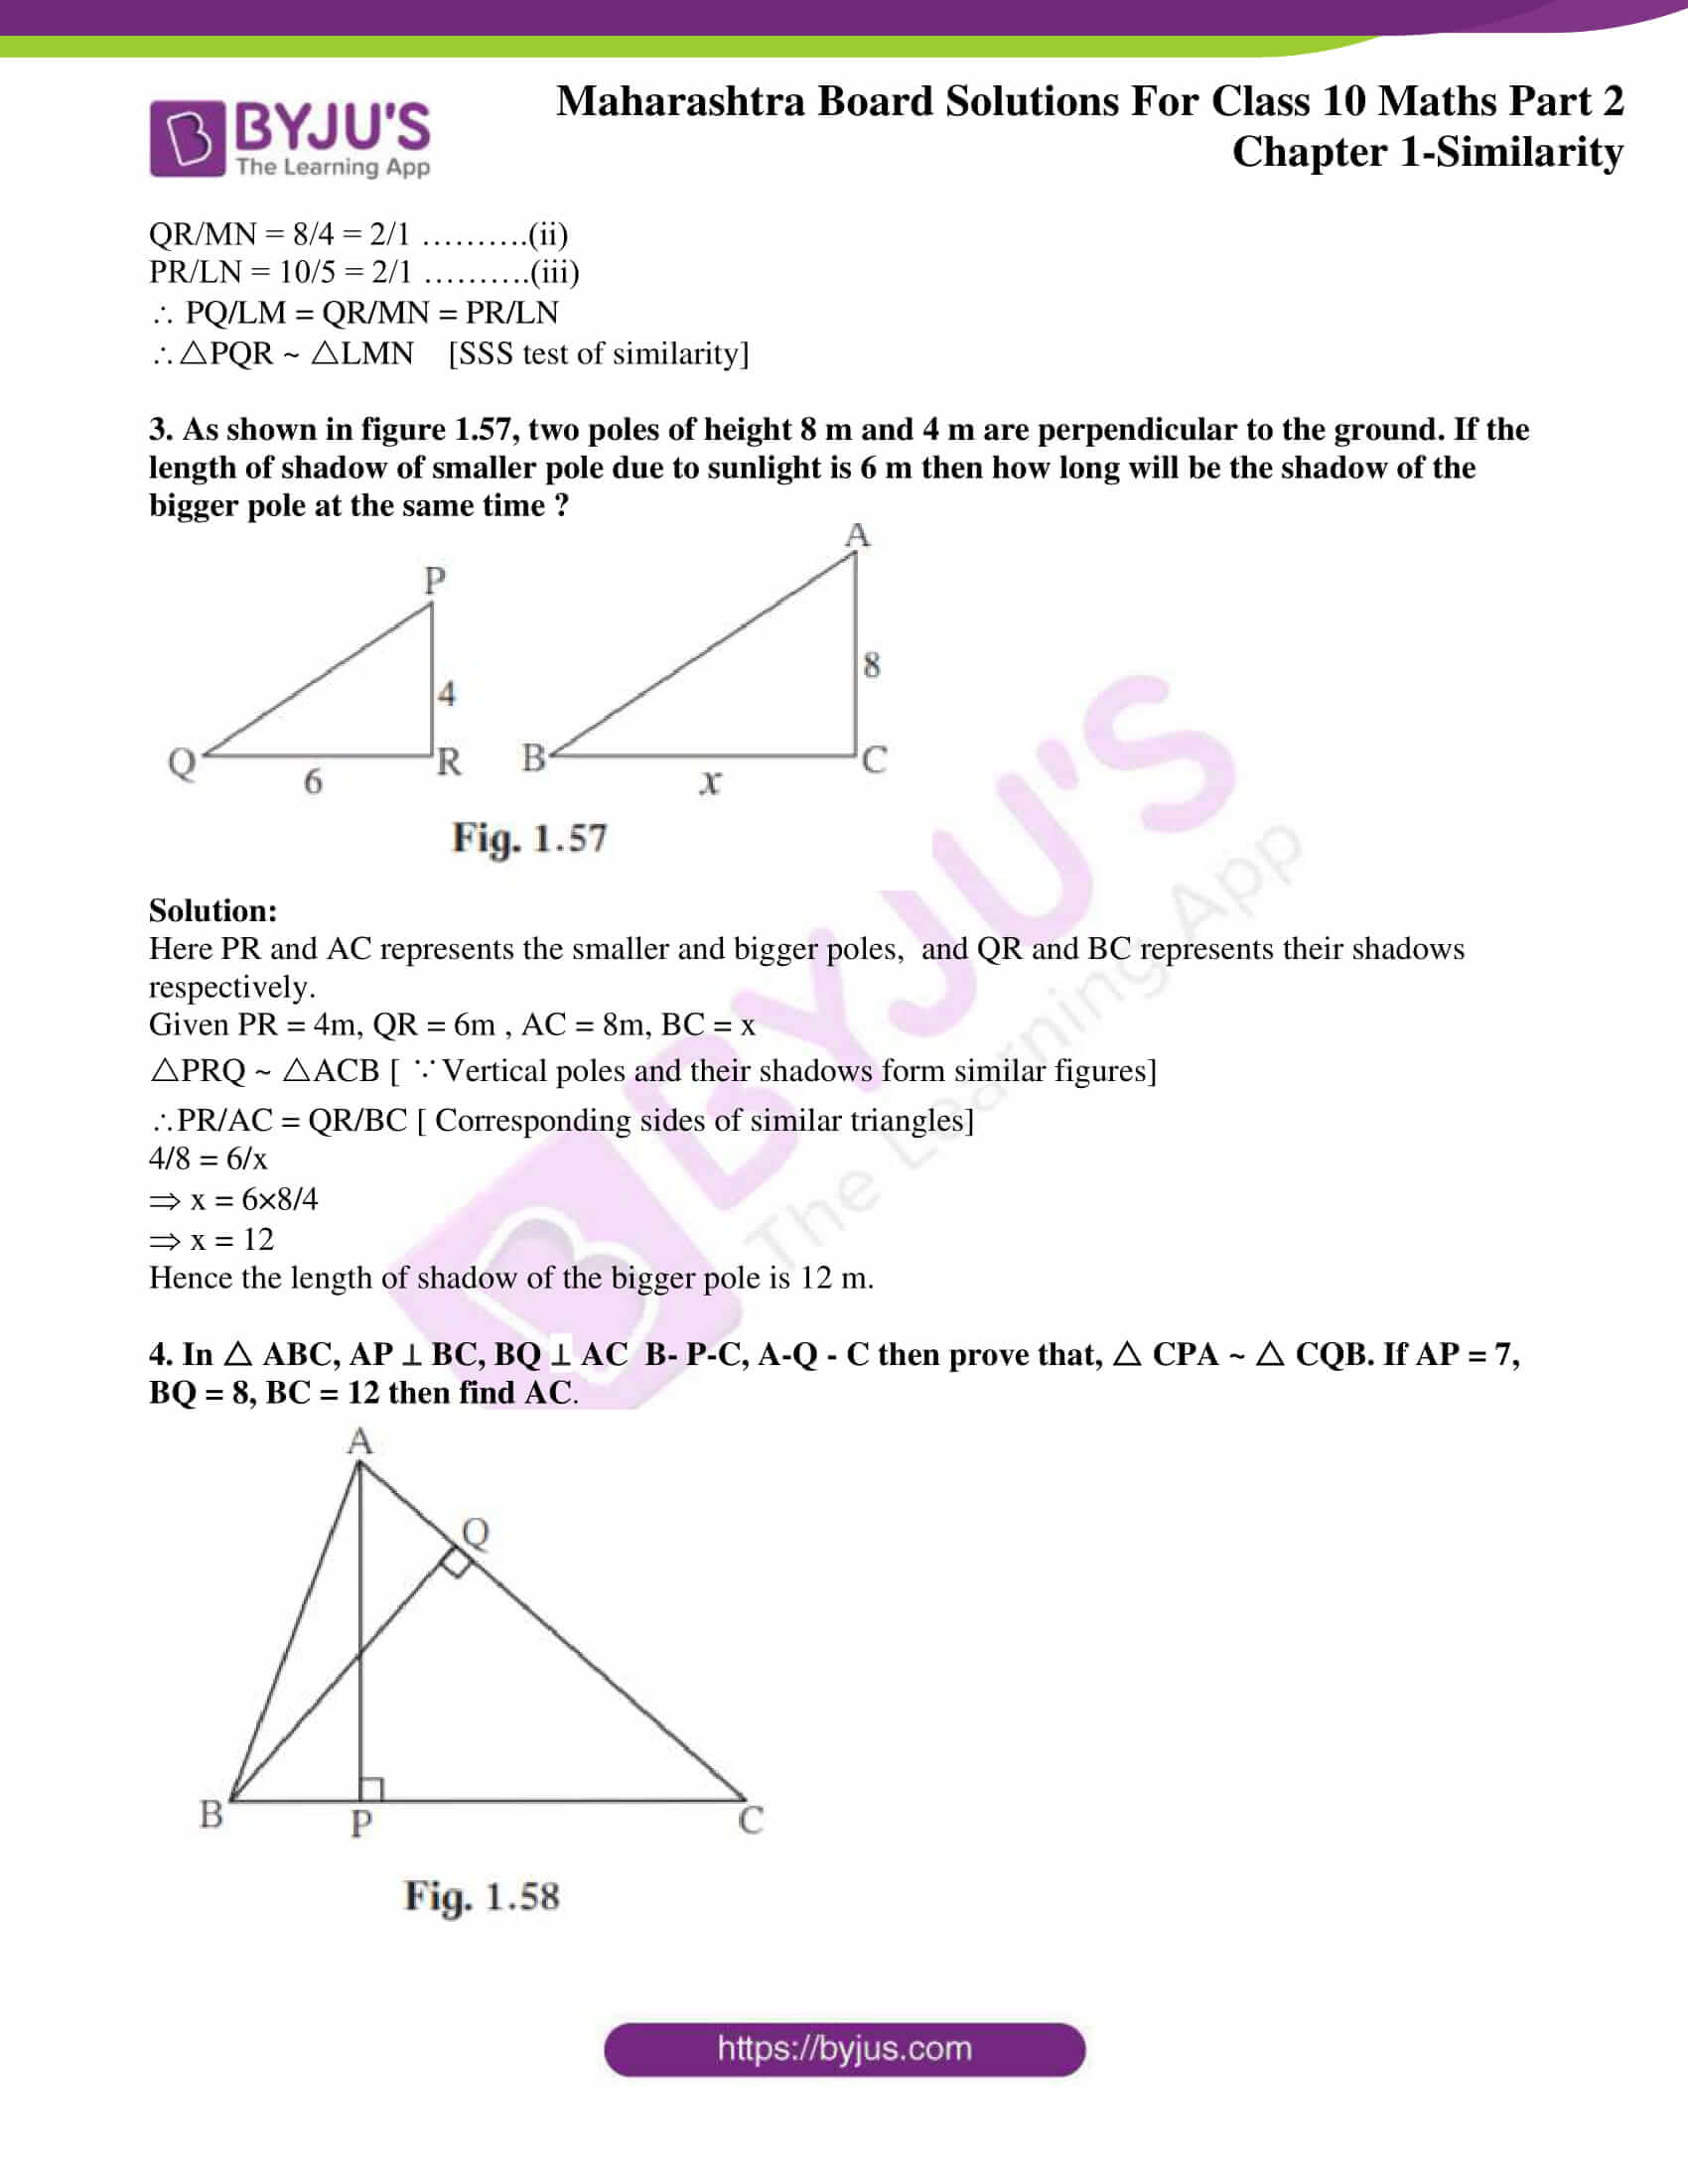 msbshse sol class 10 maths part 2 chapter 1 14